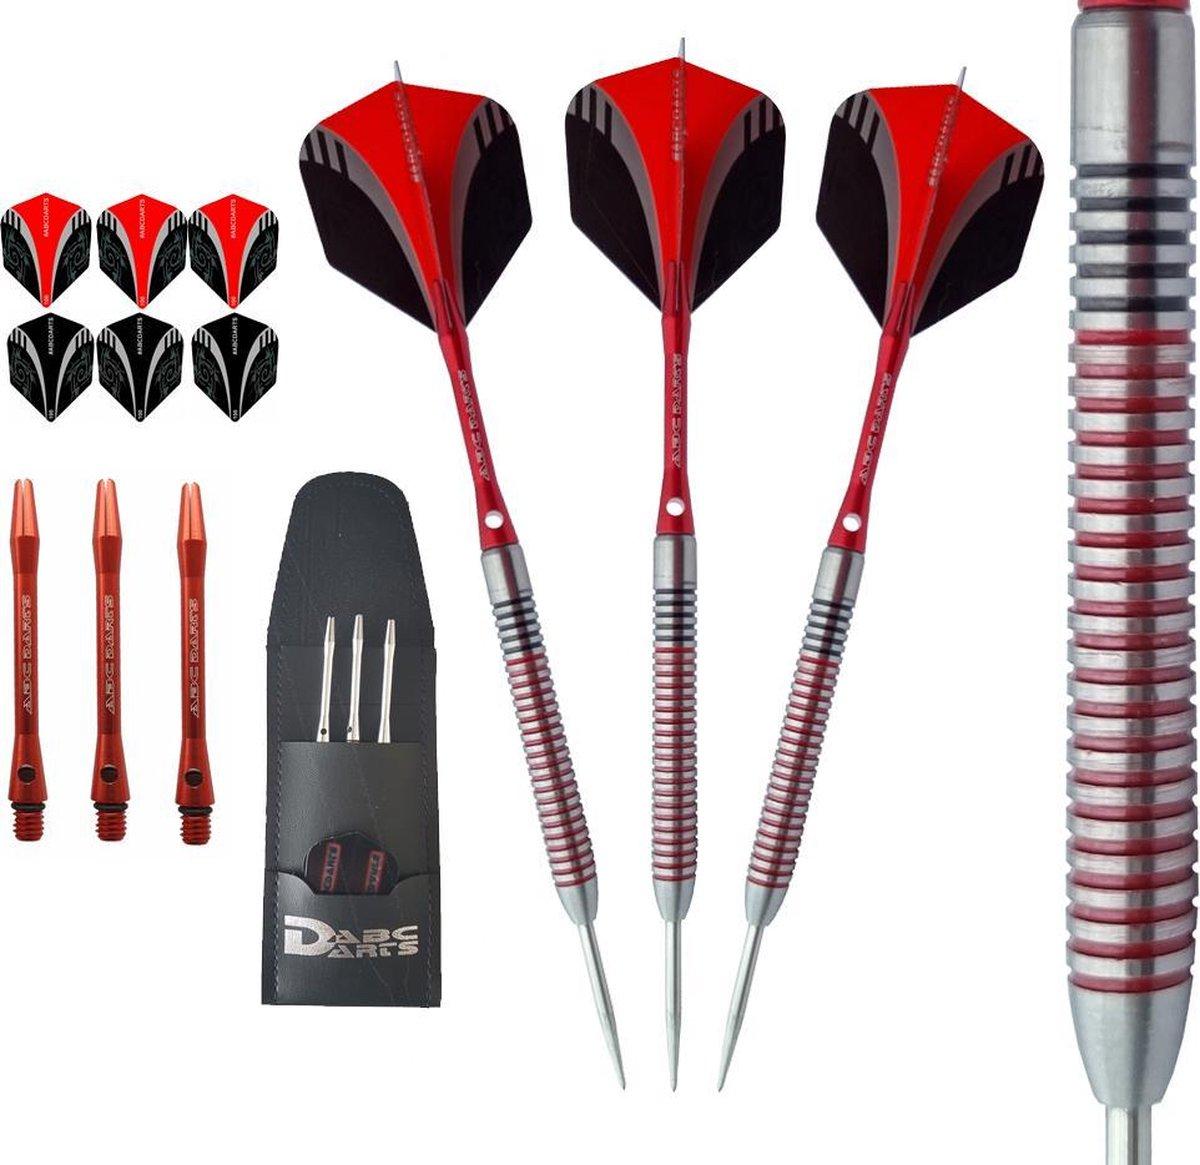 ABC Darts Professionele Dartpijlen - Red Dragonas Multi Ring - 18 gram